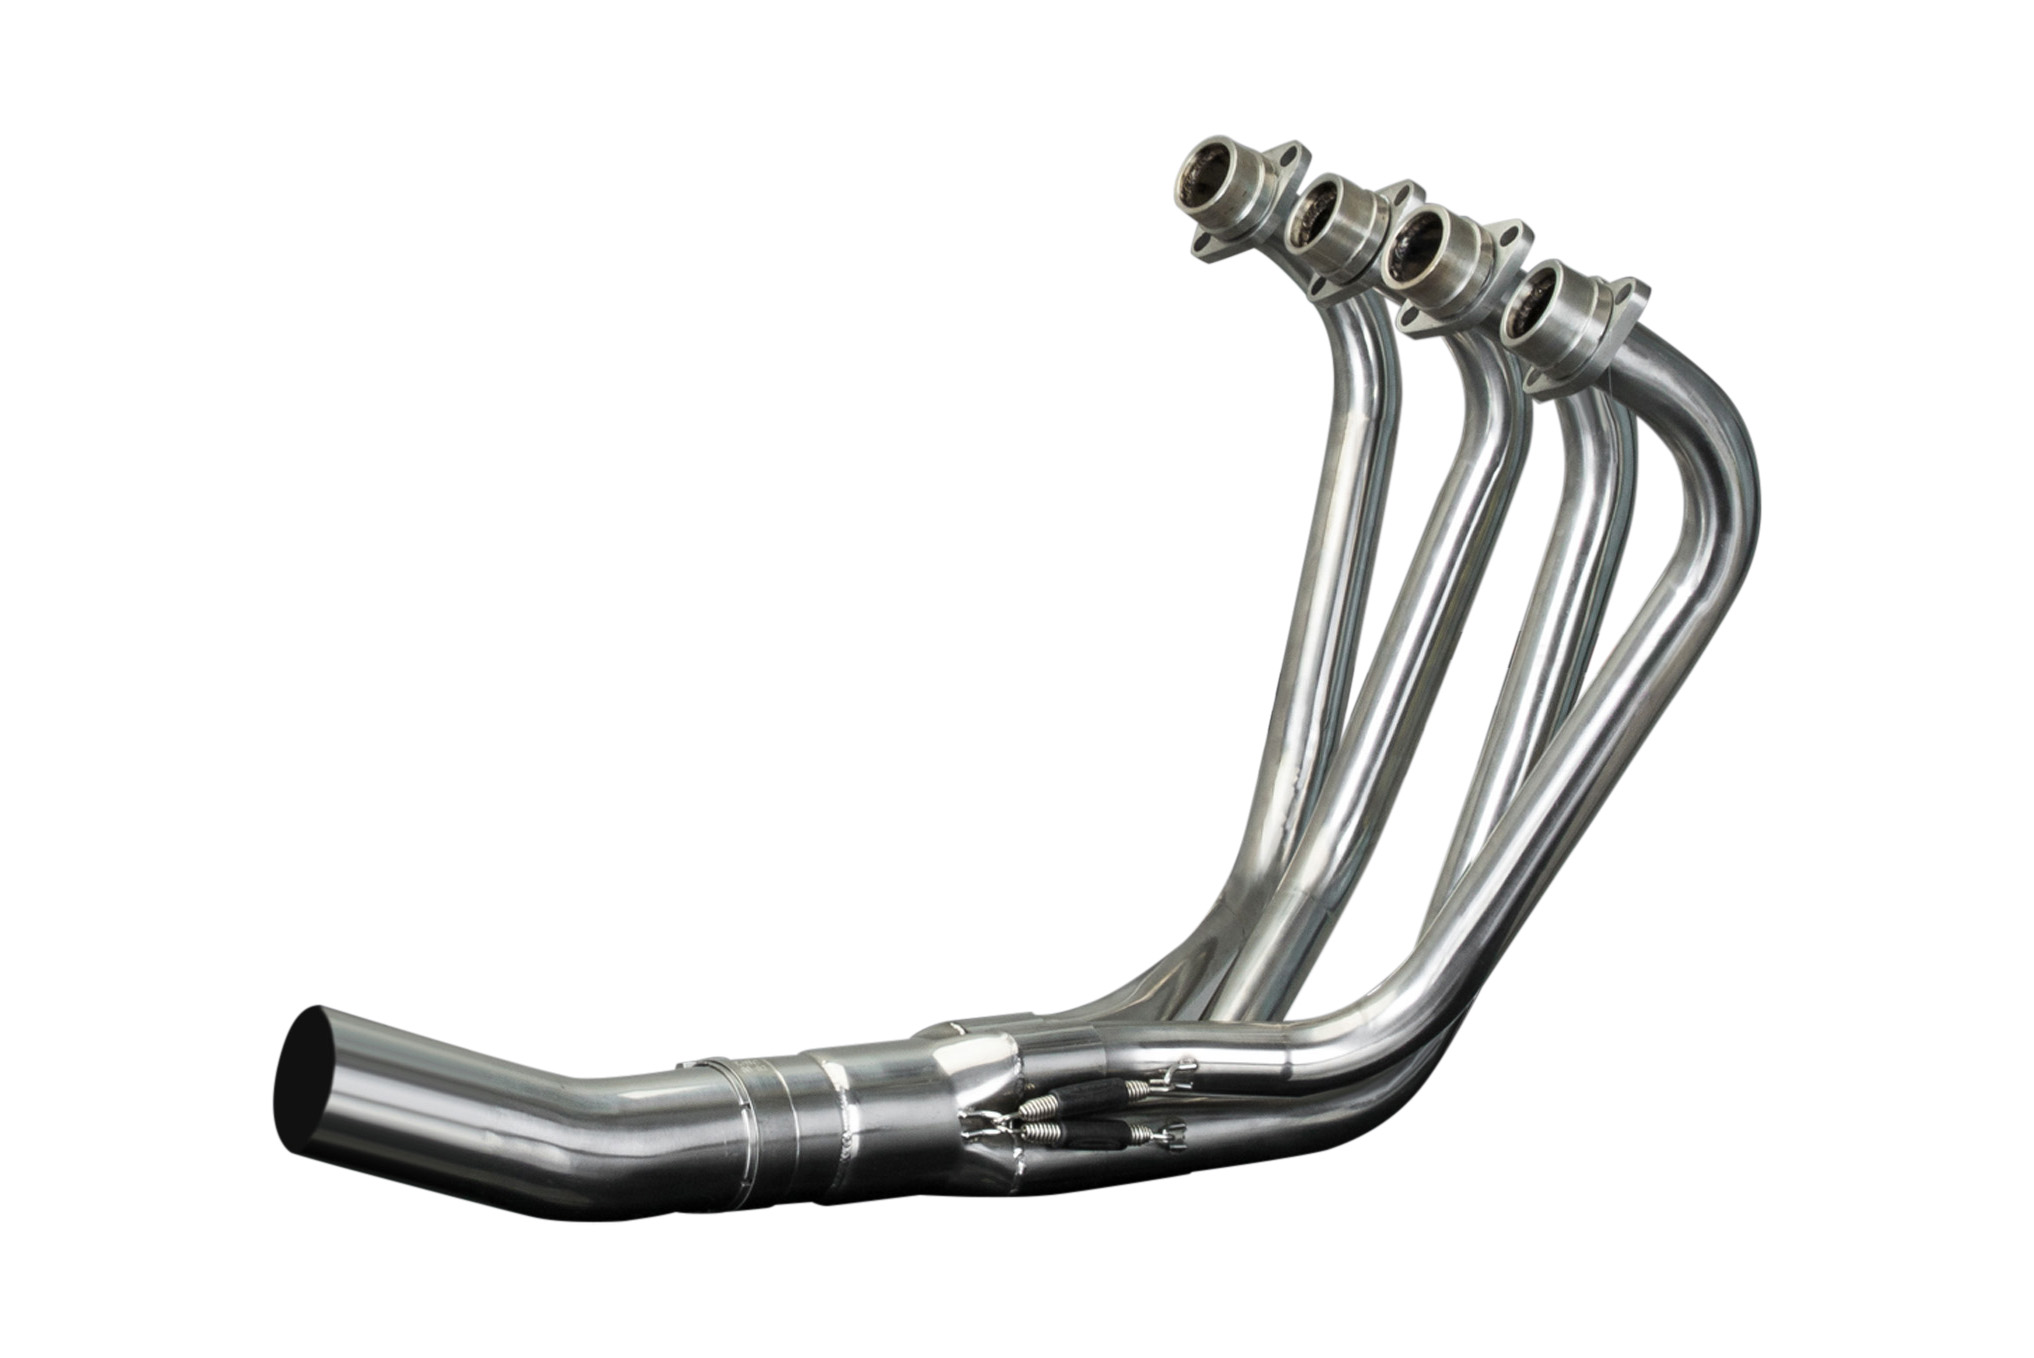 Acier Inoxydable Collecteur D'Echappement Honda CB750SC